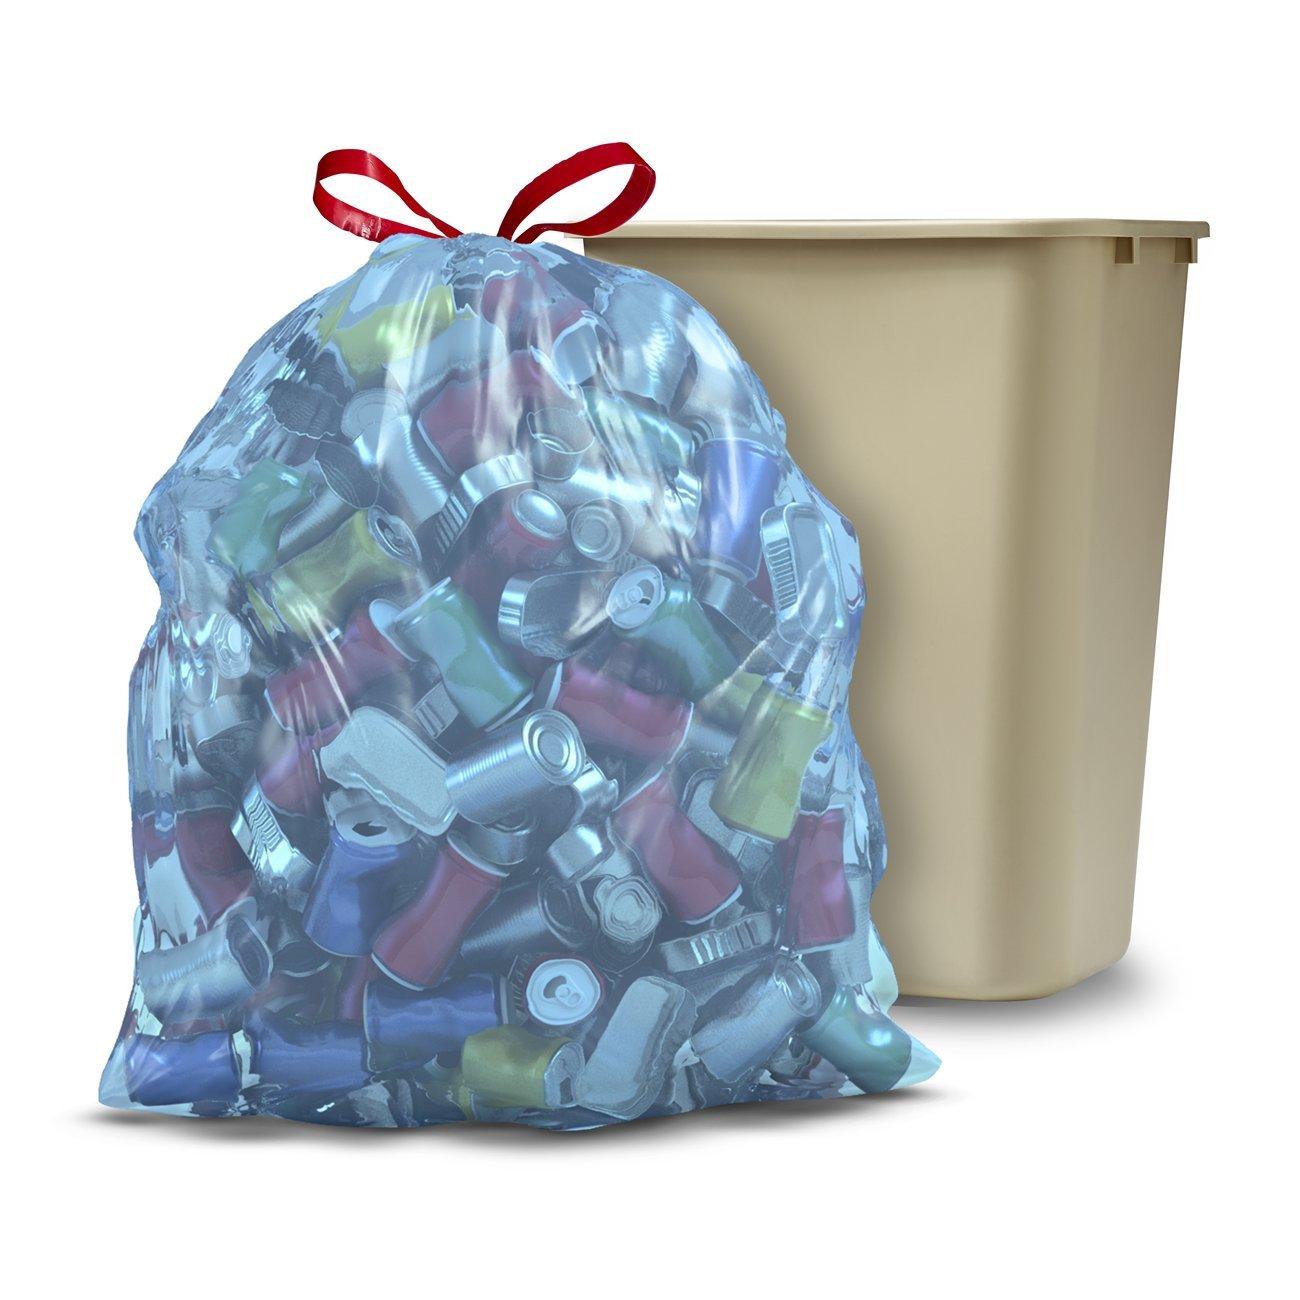 Amazon.com: Glad Recycling Tall Drawstring Kitchen Blue Trash Bags ...